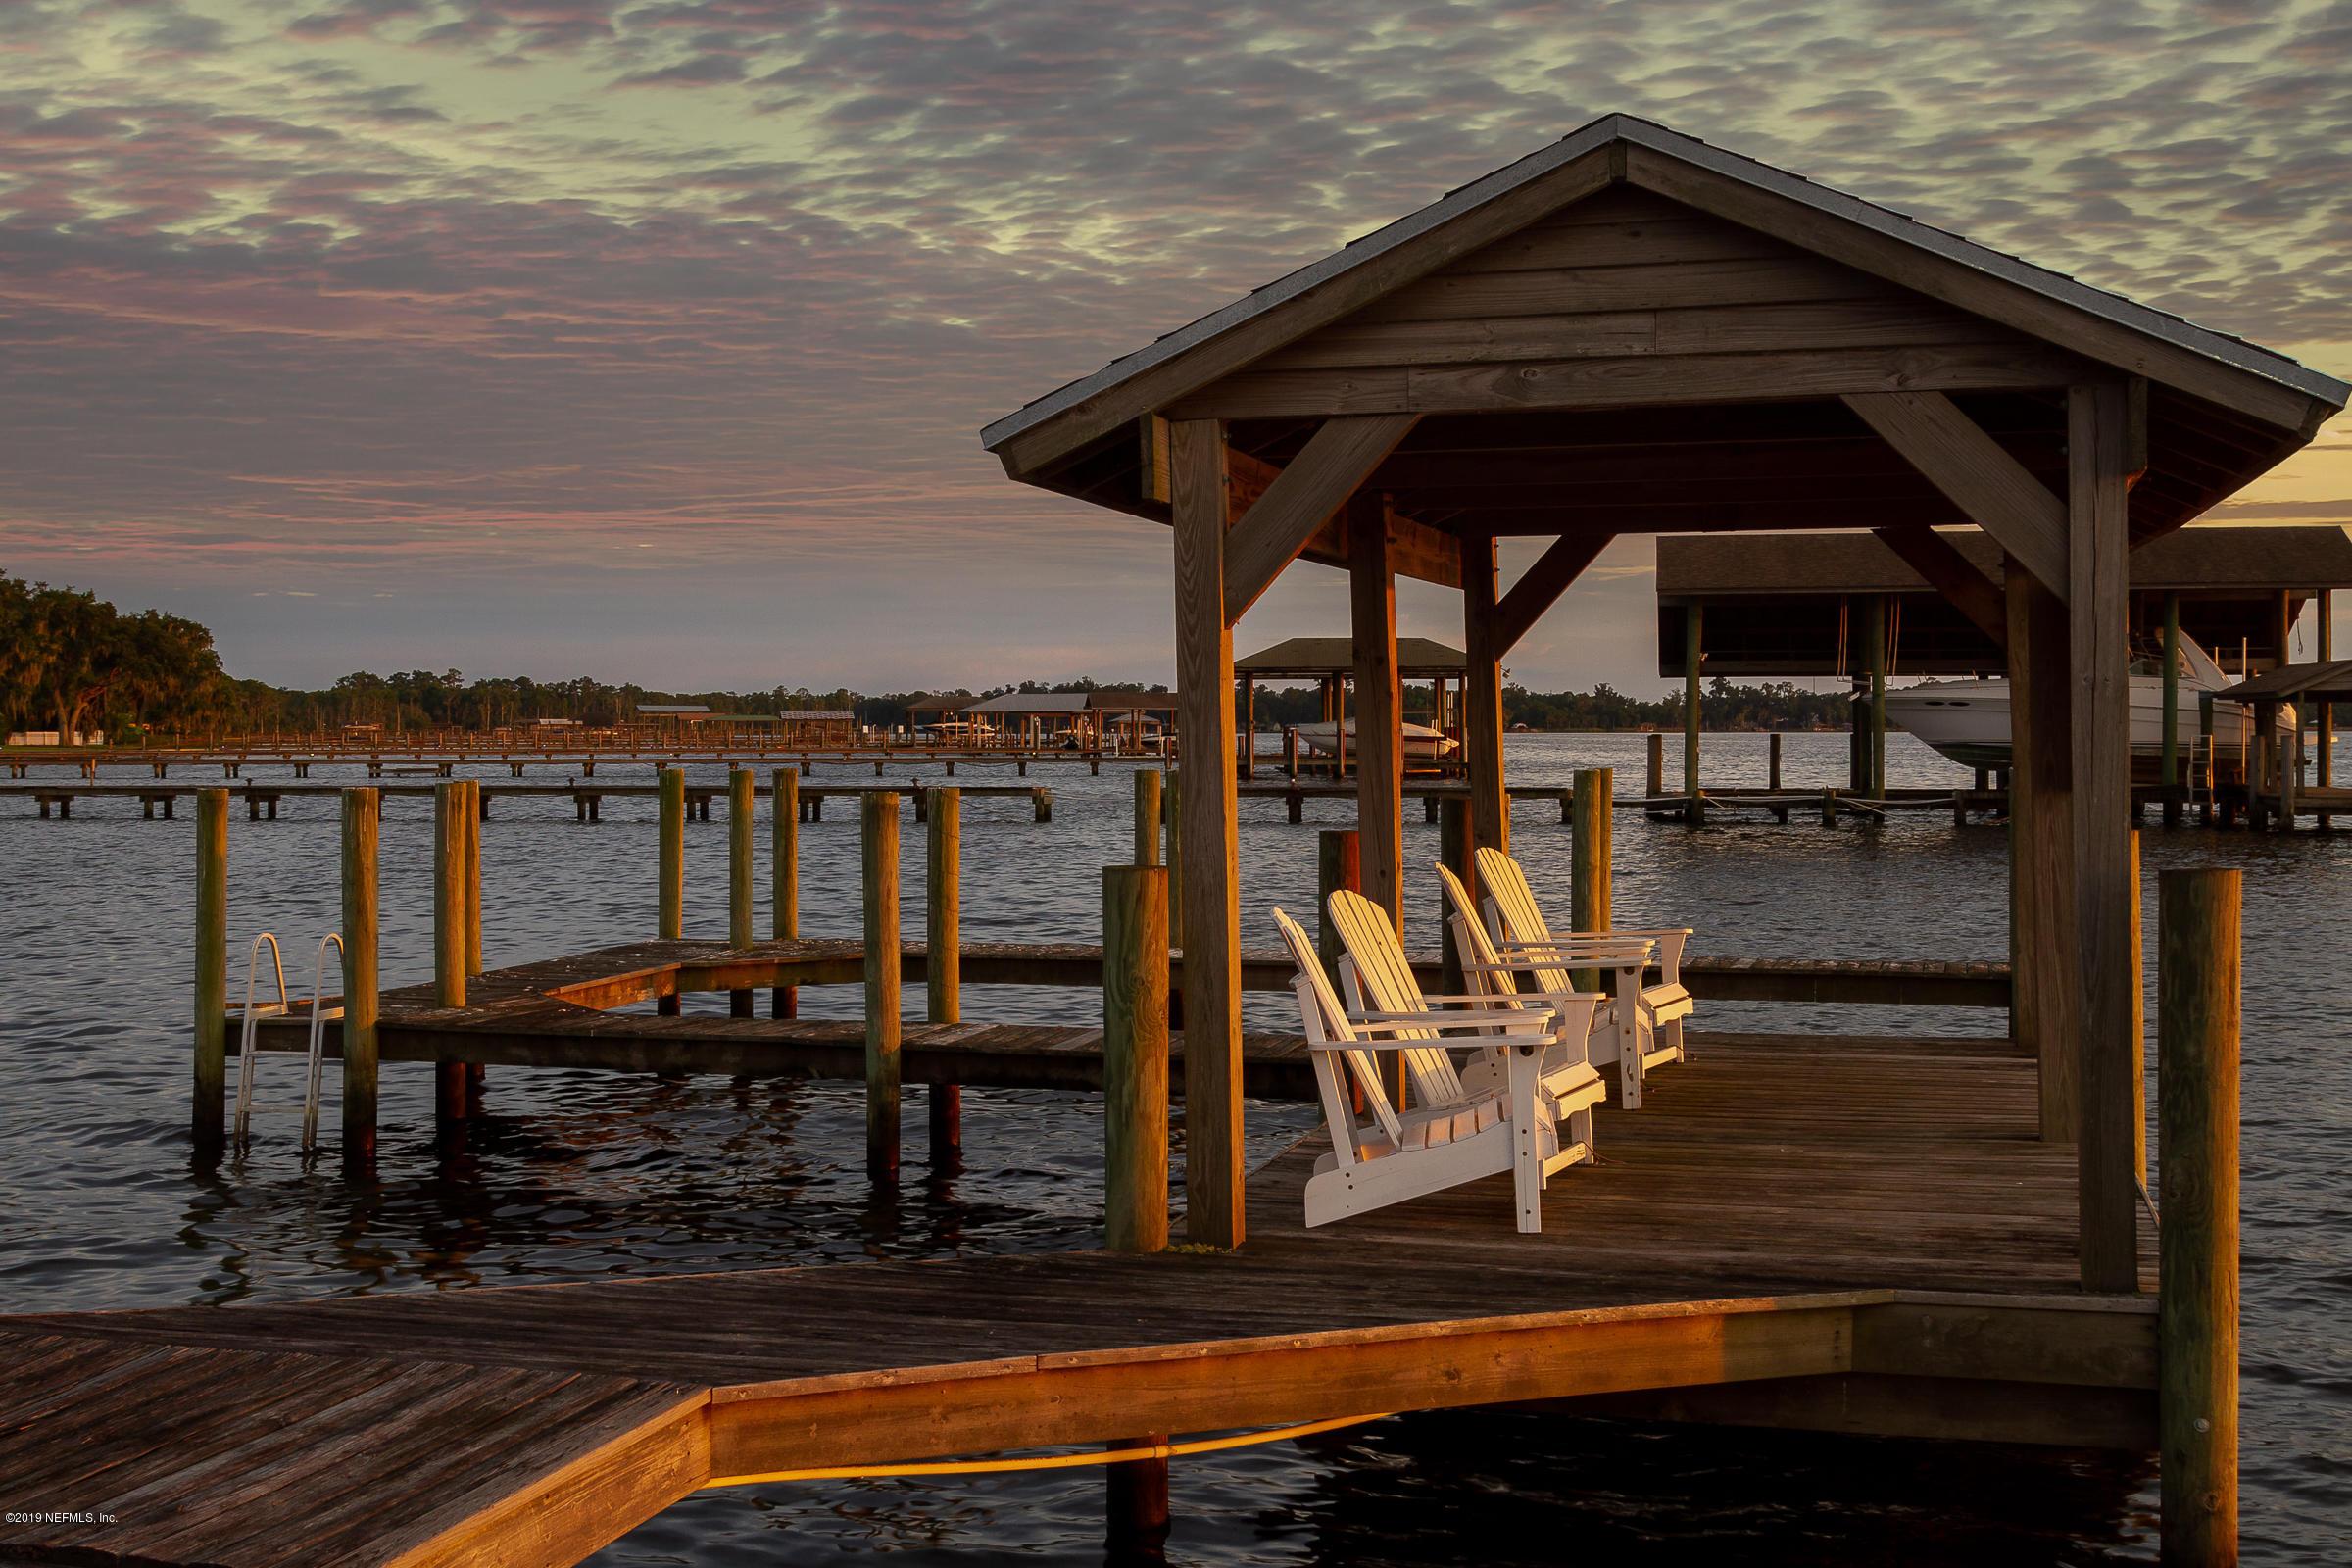 2331 LAKESHORE, FLEMING ISLAND, FLORIDA 32003, 4 Bedrooms Bedrooms, ,3 BathroomsBathrooms,Residential,For sale,LAKESHORE,1009805